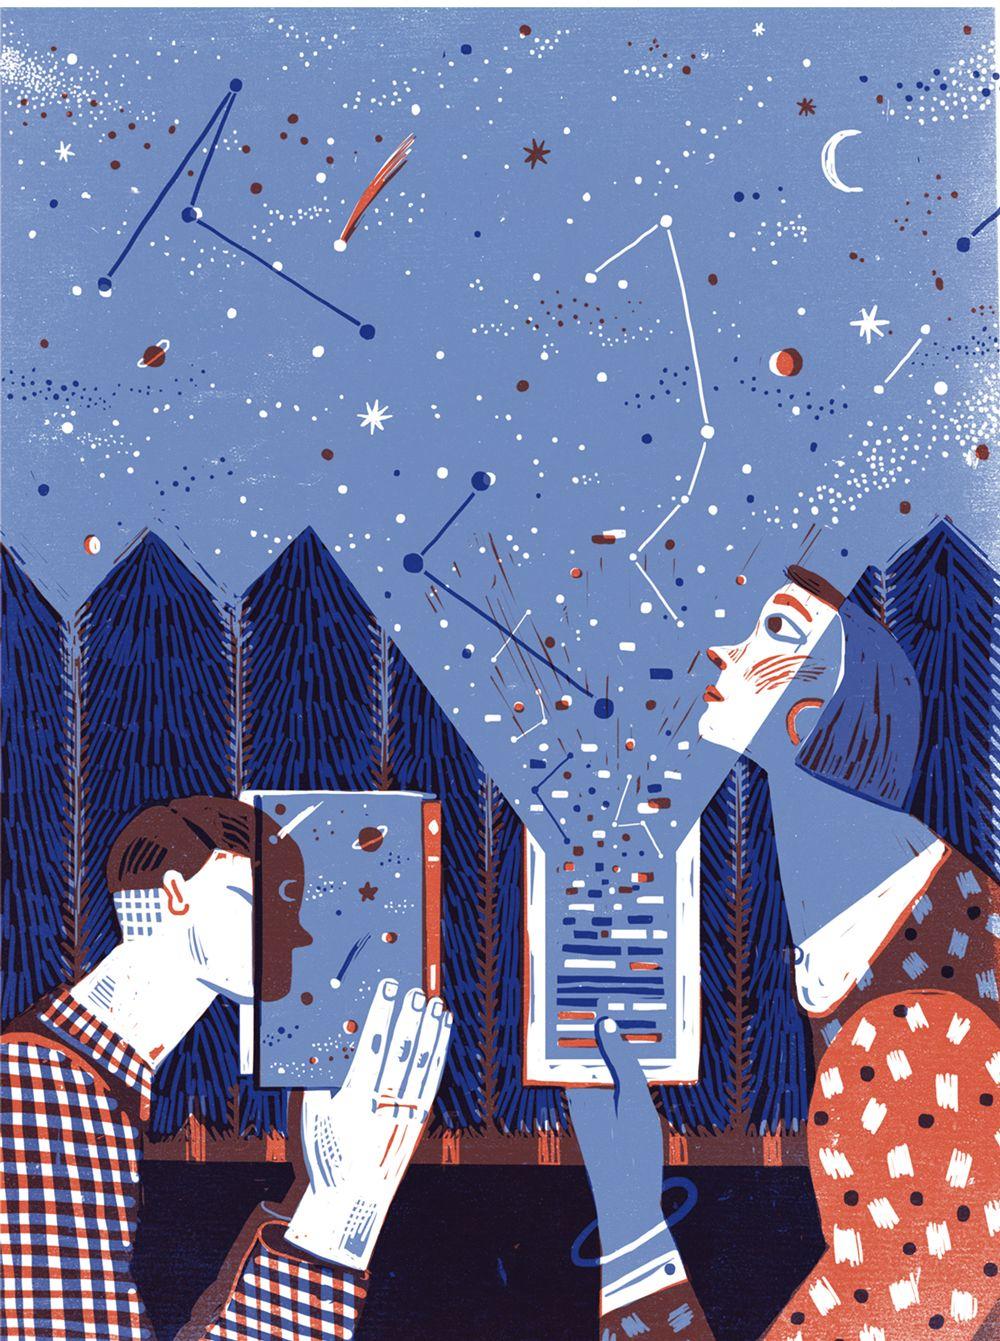 editorial illustration for Nautilus magazine on the